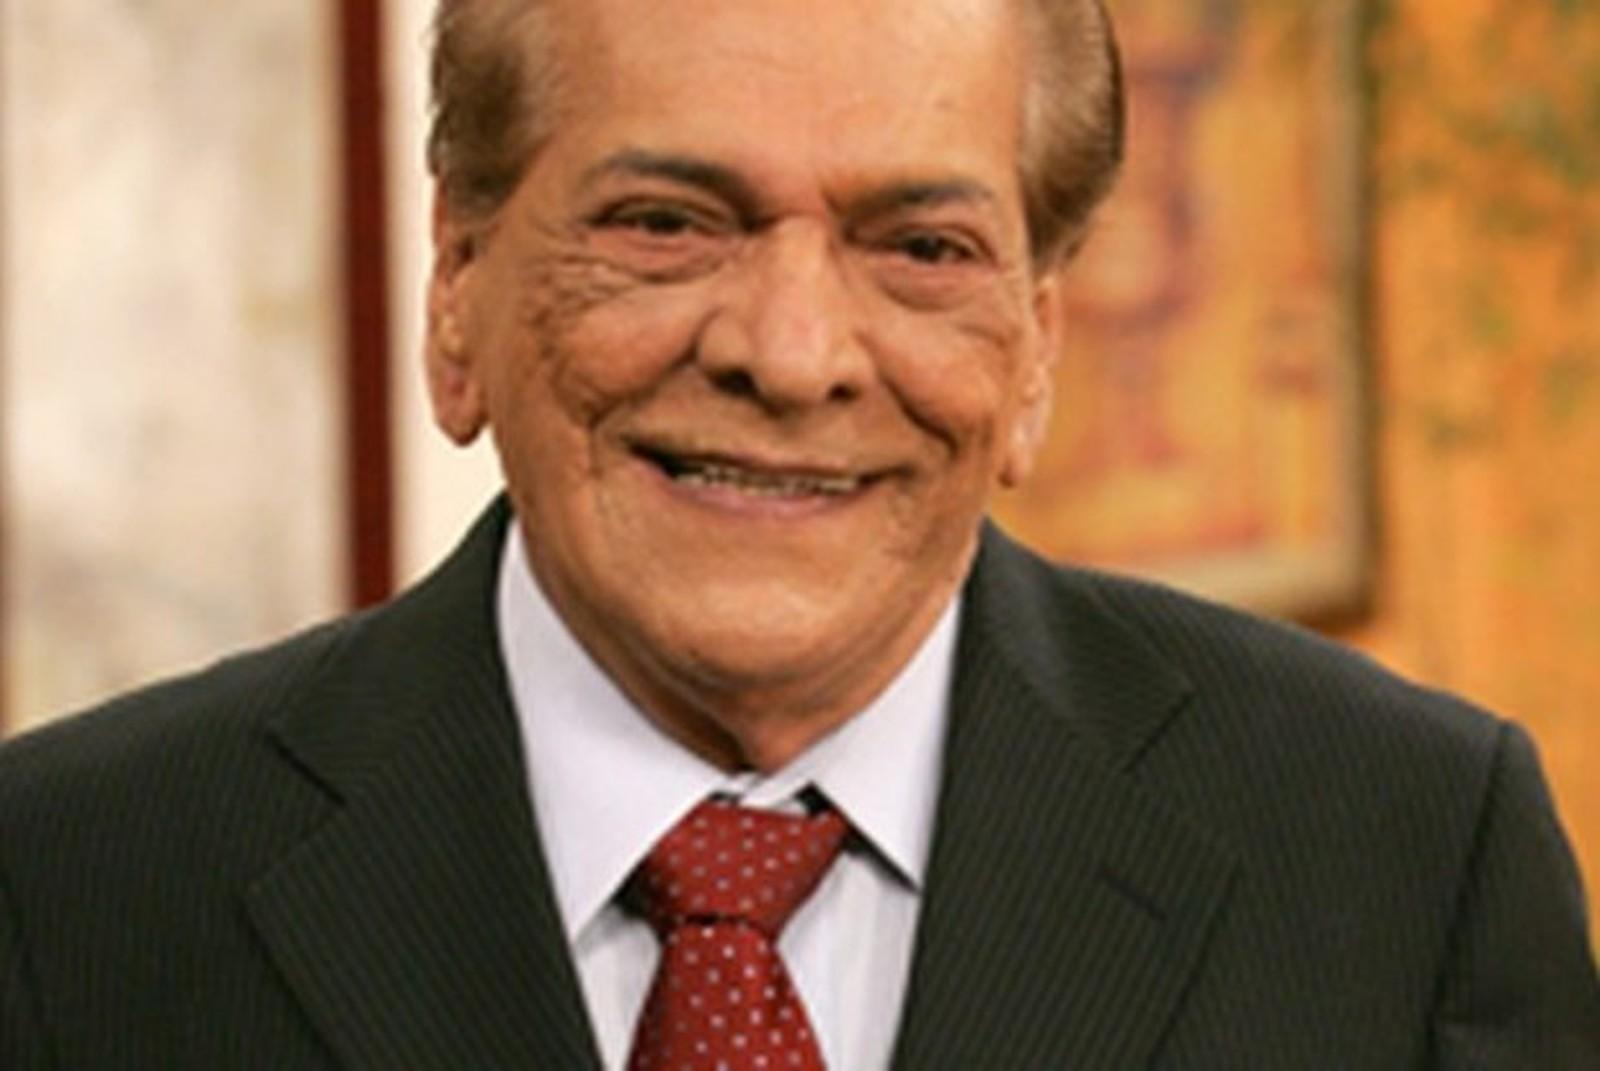 Lúcio Mauro, ator e comediante, morre aos 92 anos  no Rio de Janeiro.